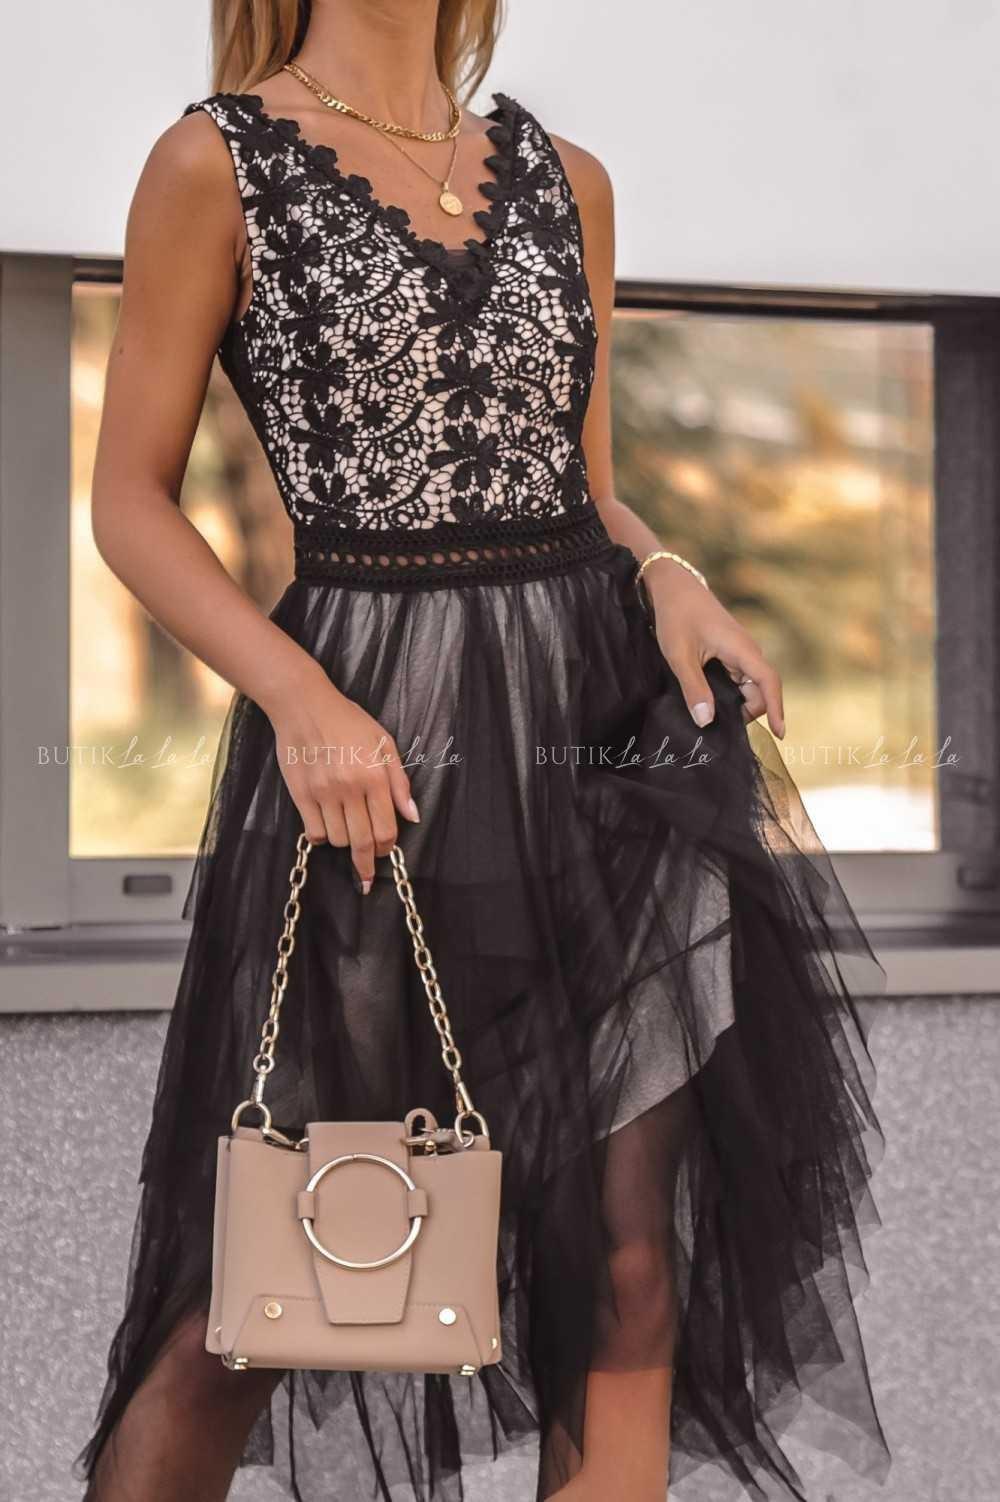 sukienka czarna koronka tiul